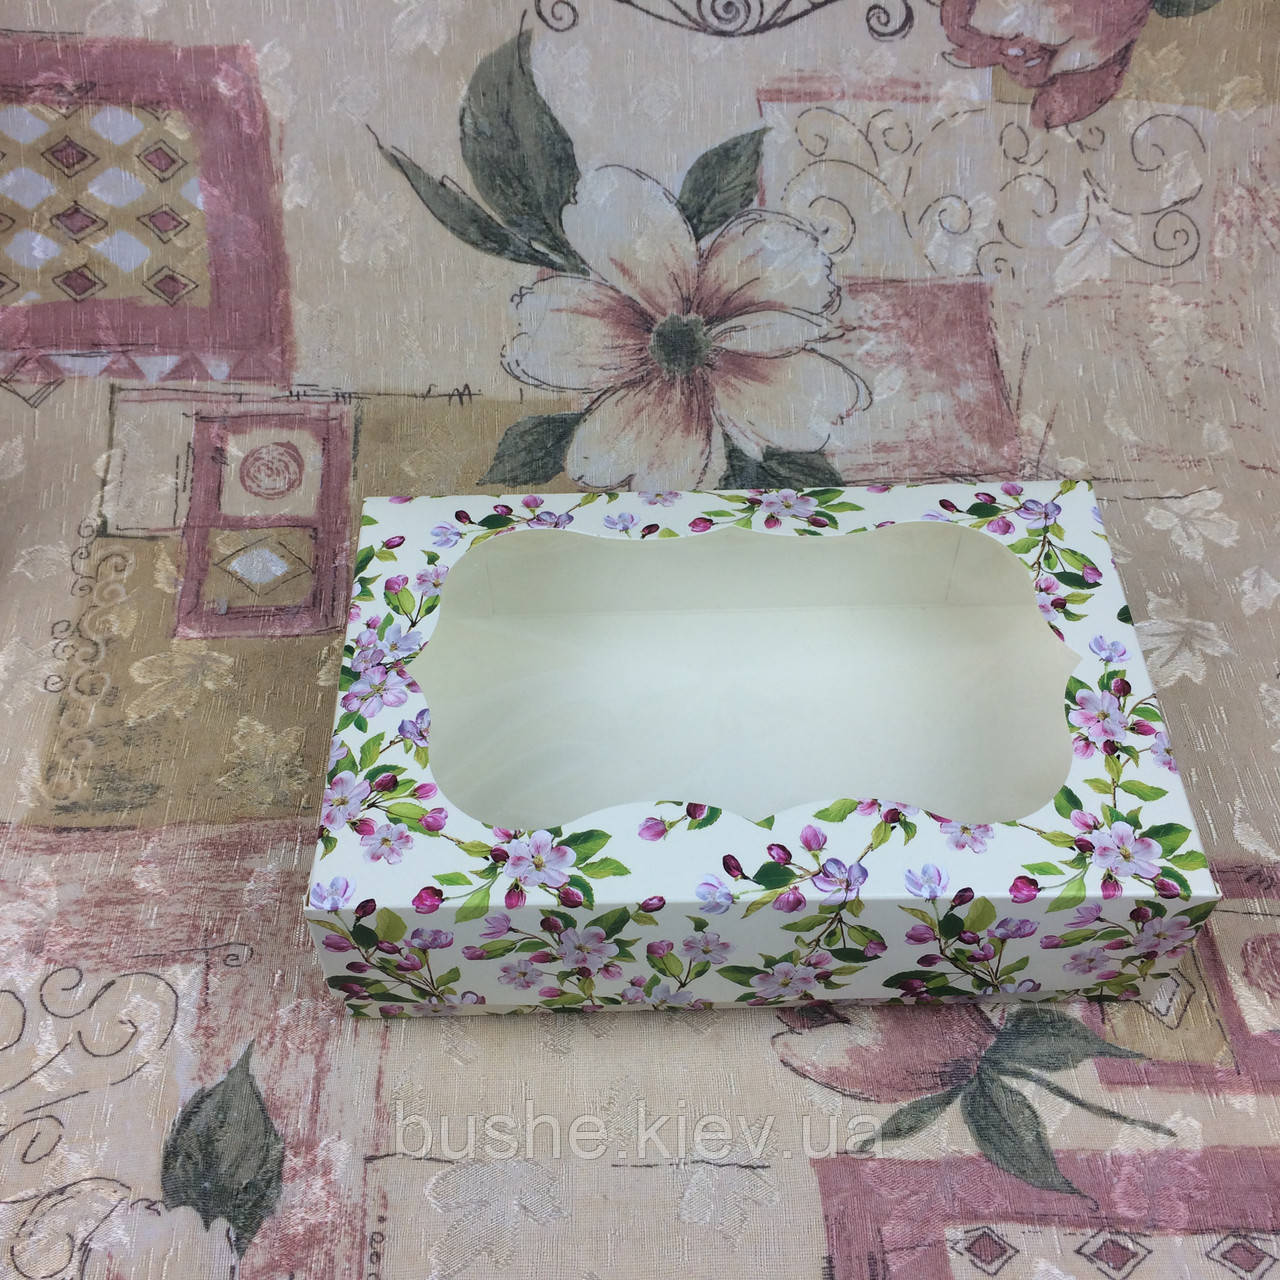 Коробка под зефир / *h=6* / 230х150х60 мм / печать-Весна / окно-обычн / лк / цв